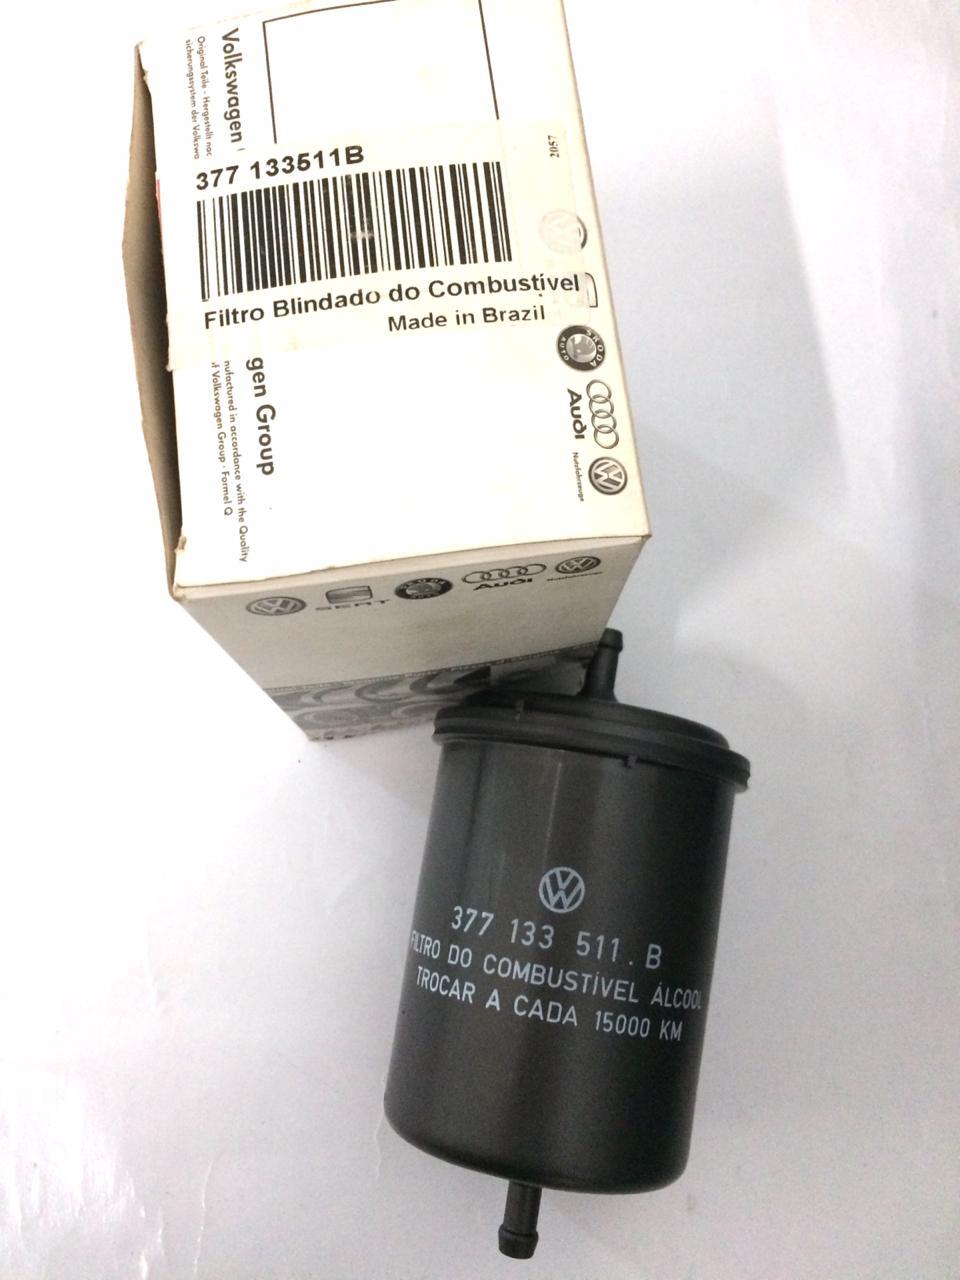 Filtro Combustível Vw Gol Saveiro Kombi 377133511B